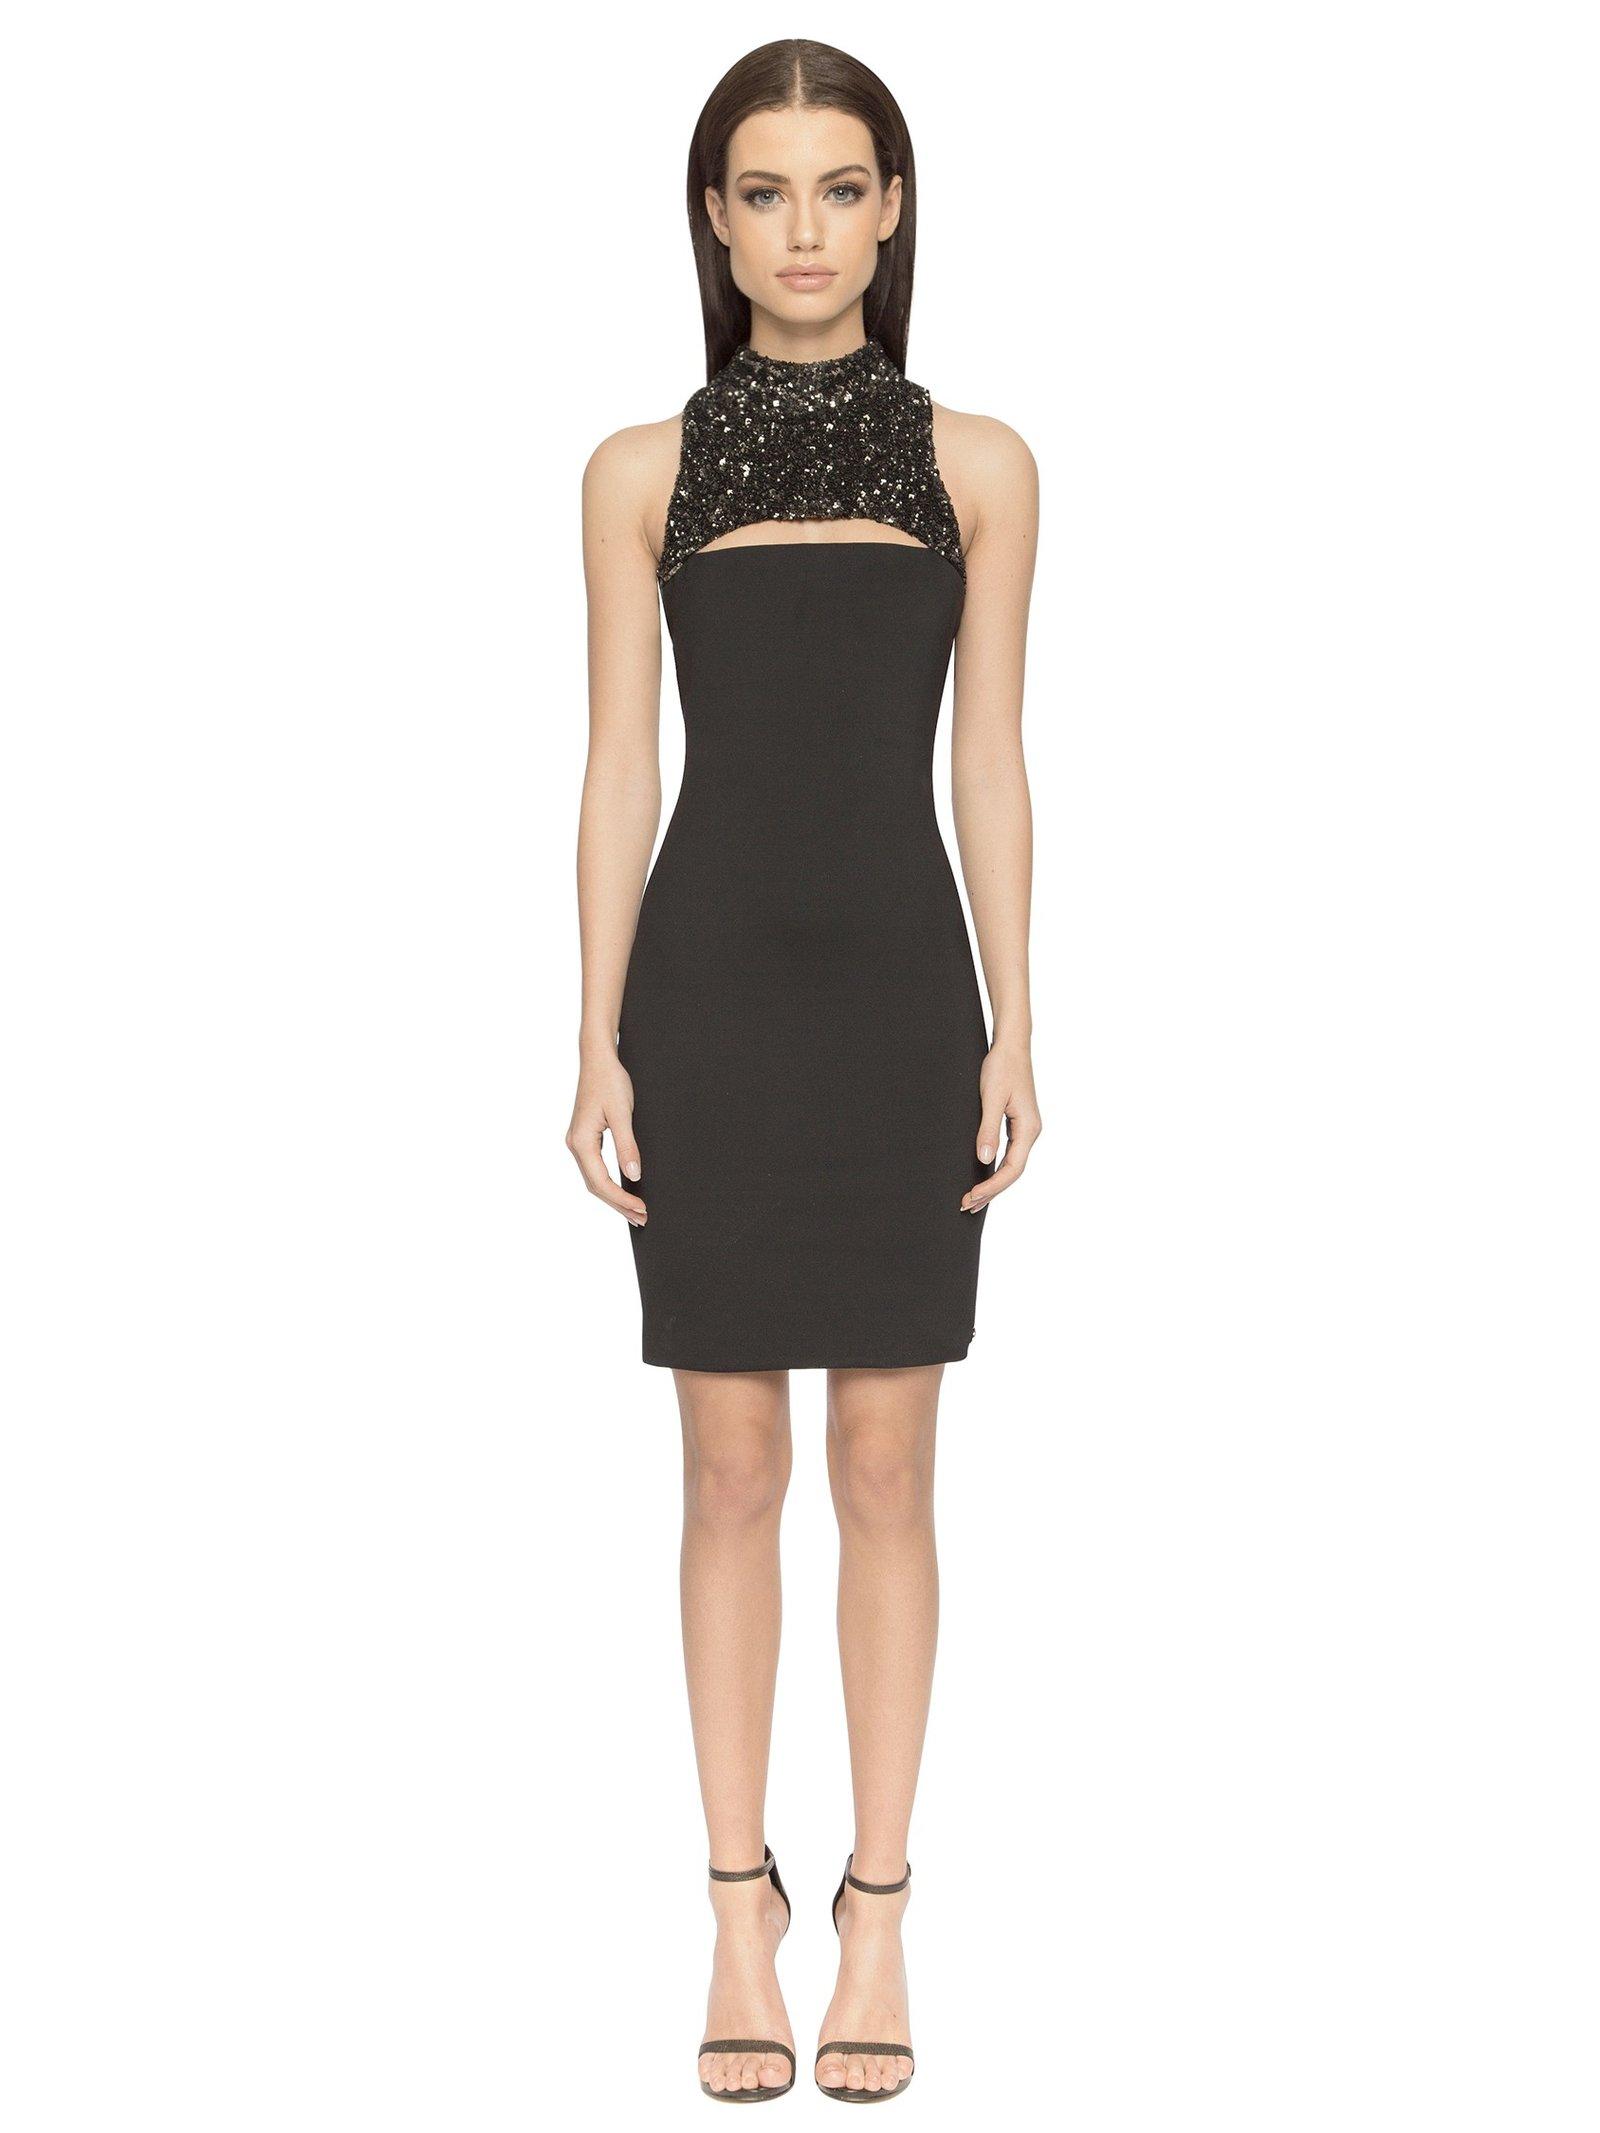 Aloura London Madison Dress - Black